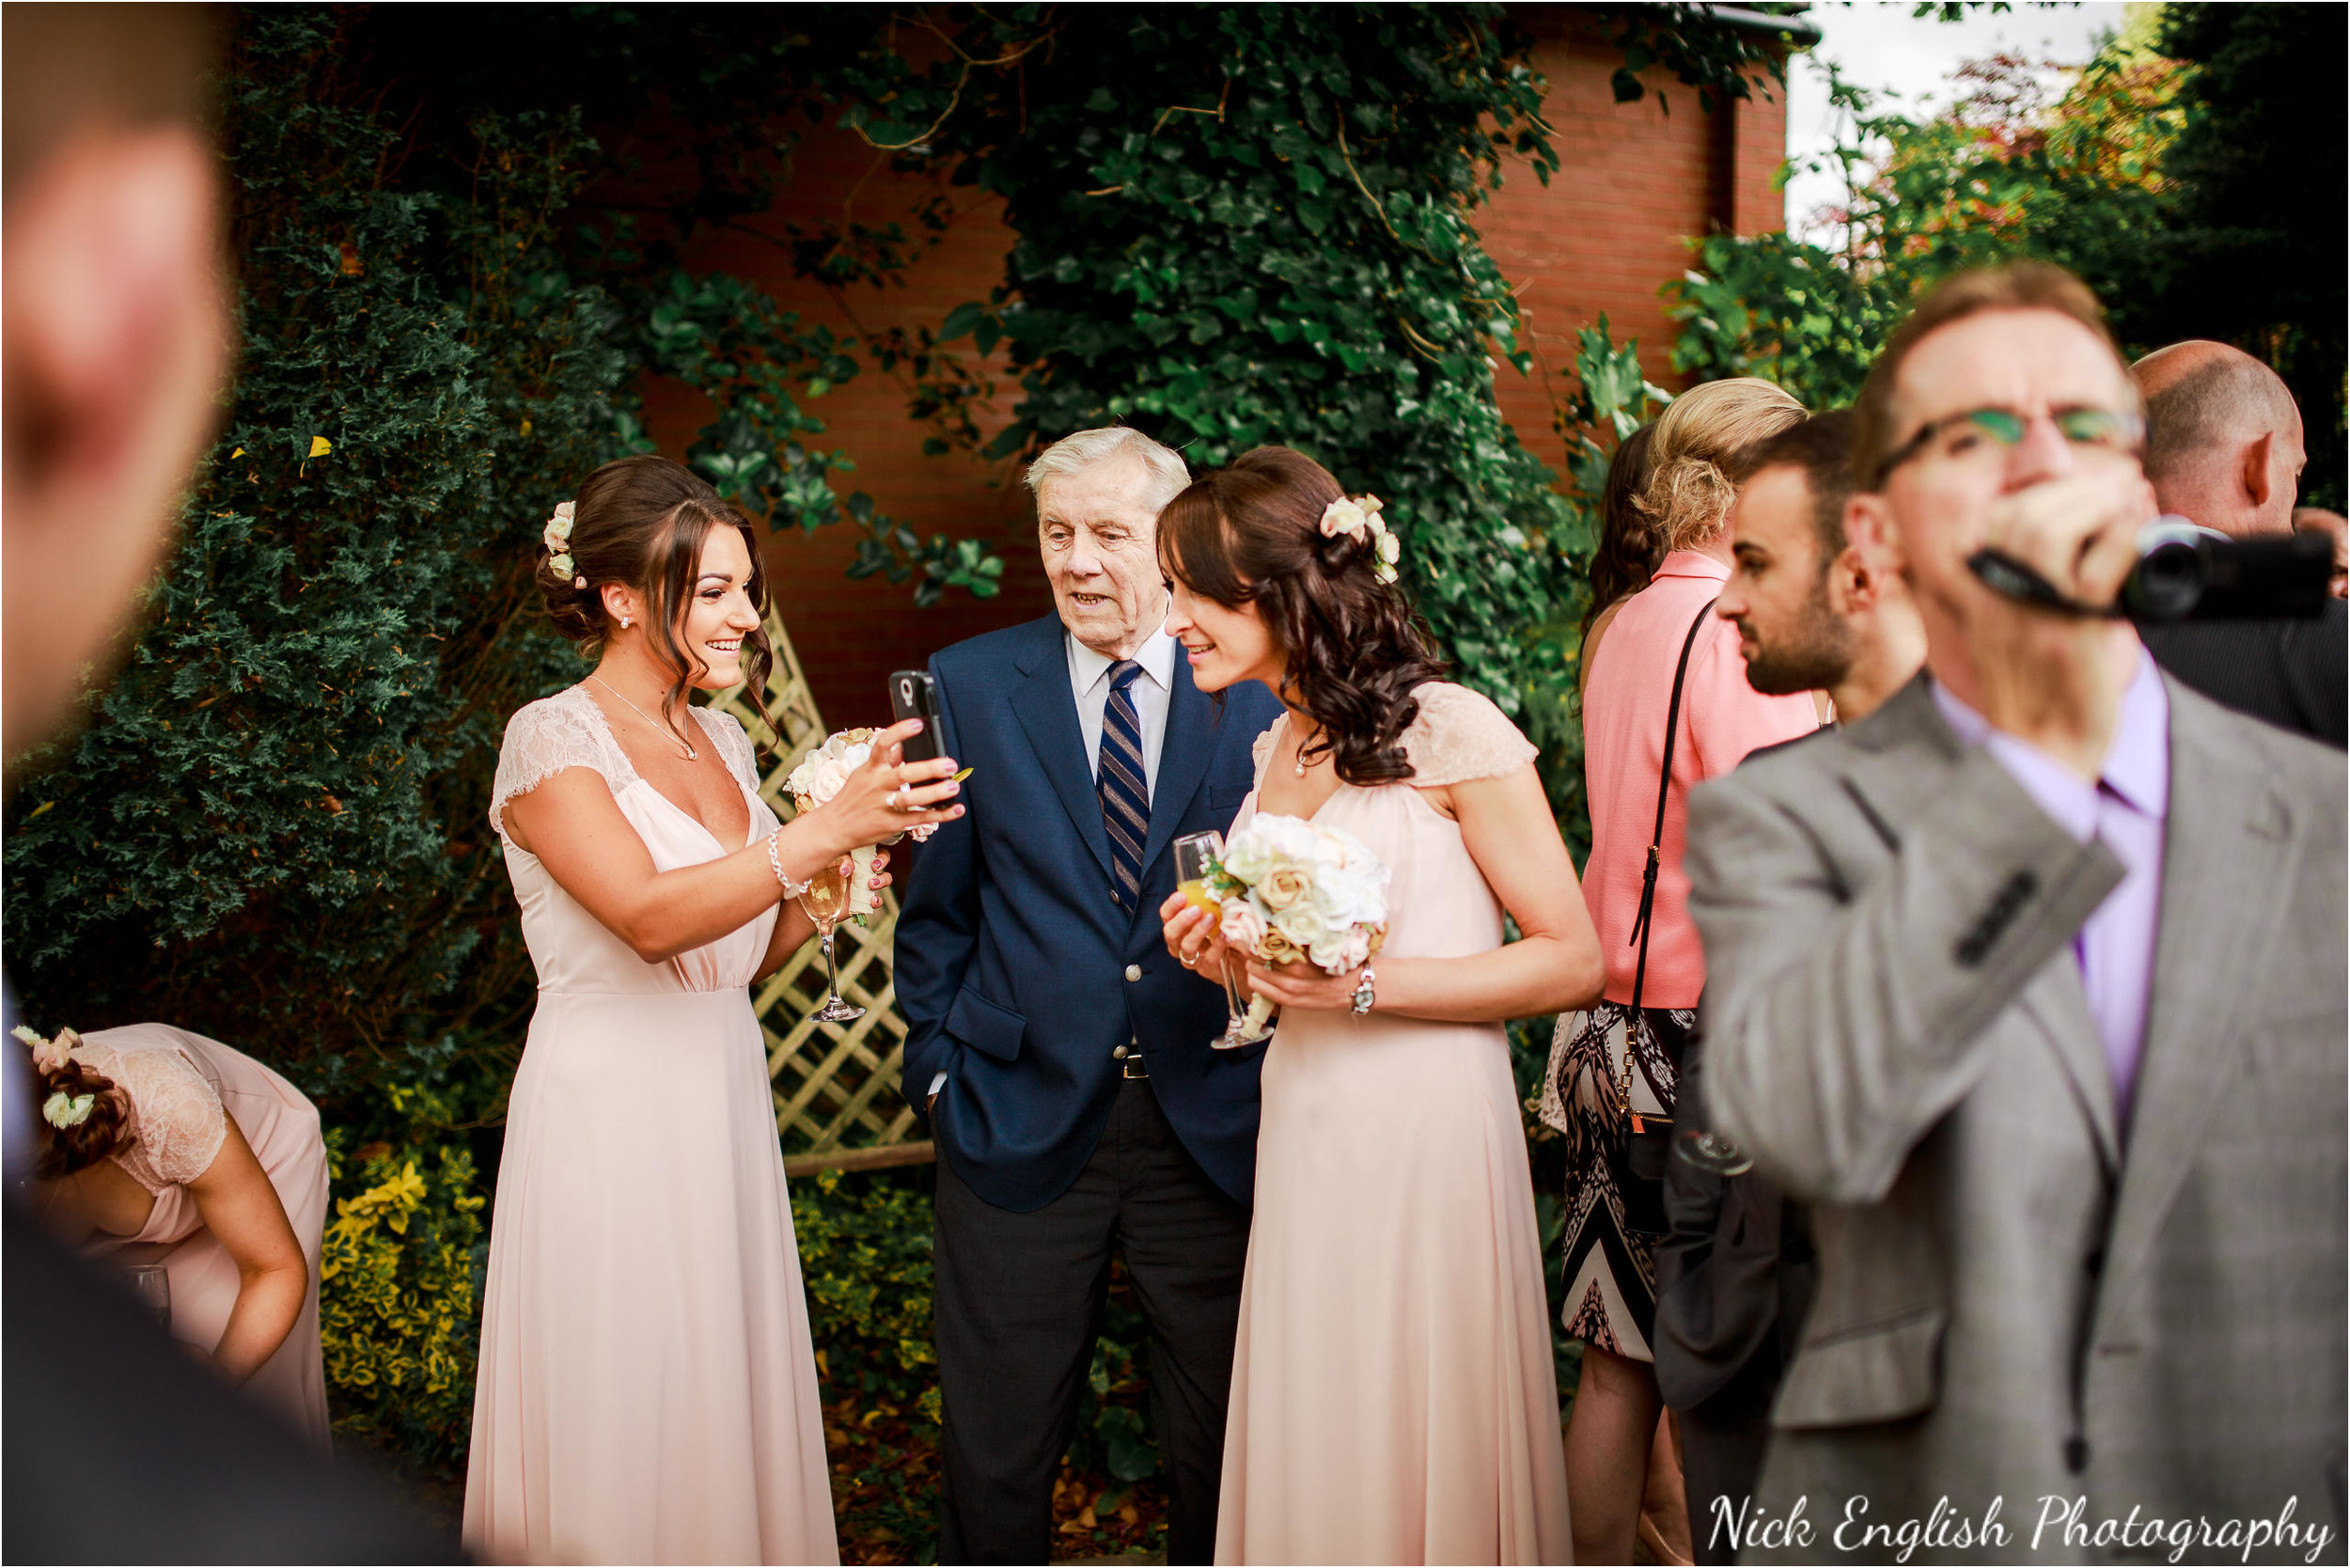 Emily David Wedding Photographs at Barton Grange Preston by Nick English Photography 111jpg.jpeg